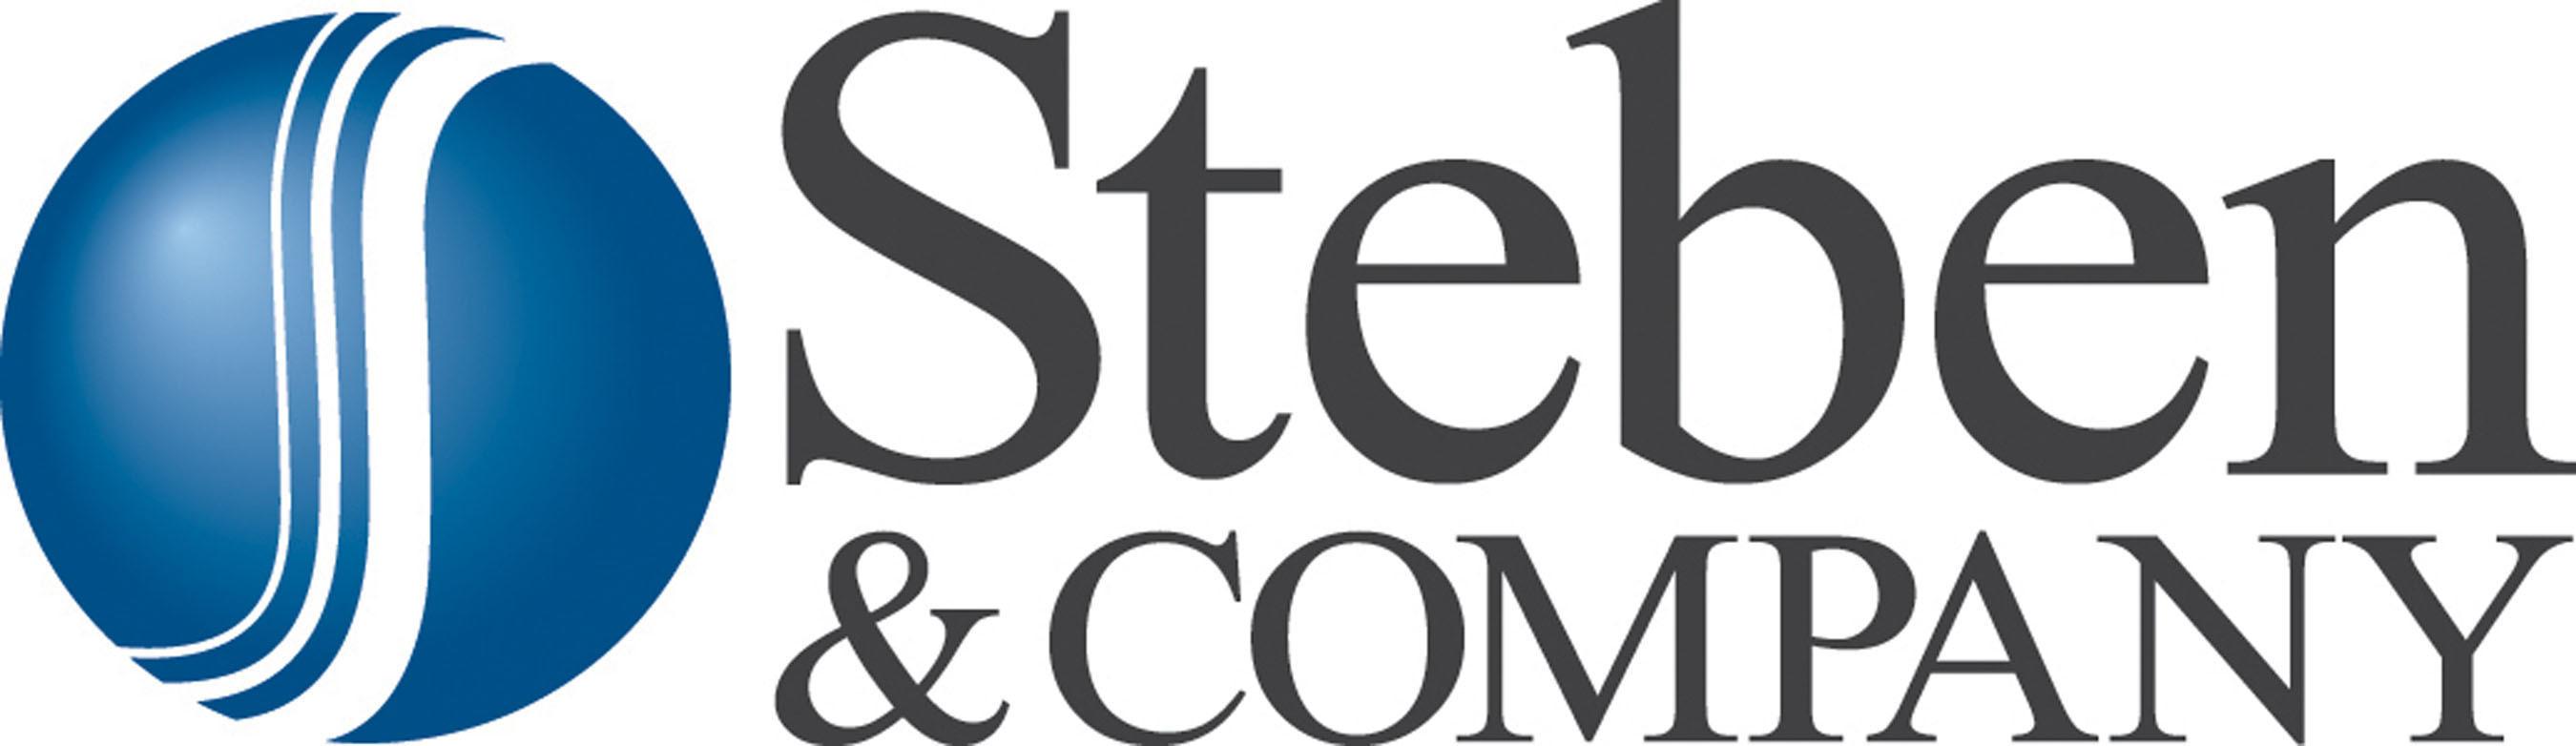 Steben & Company, Inc. logo.